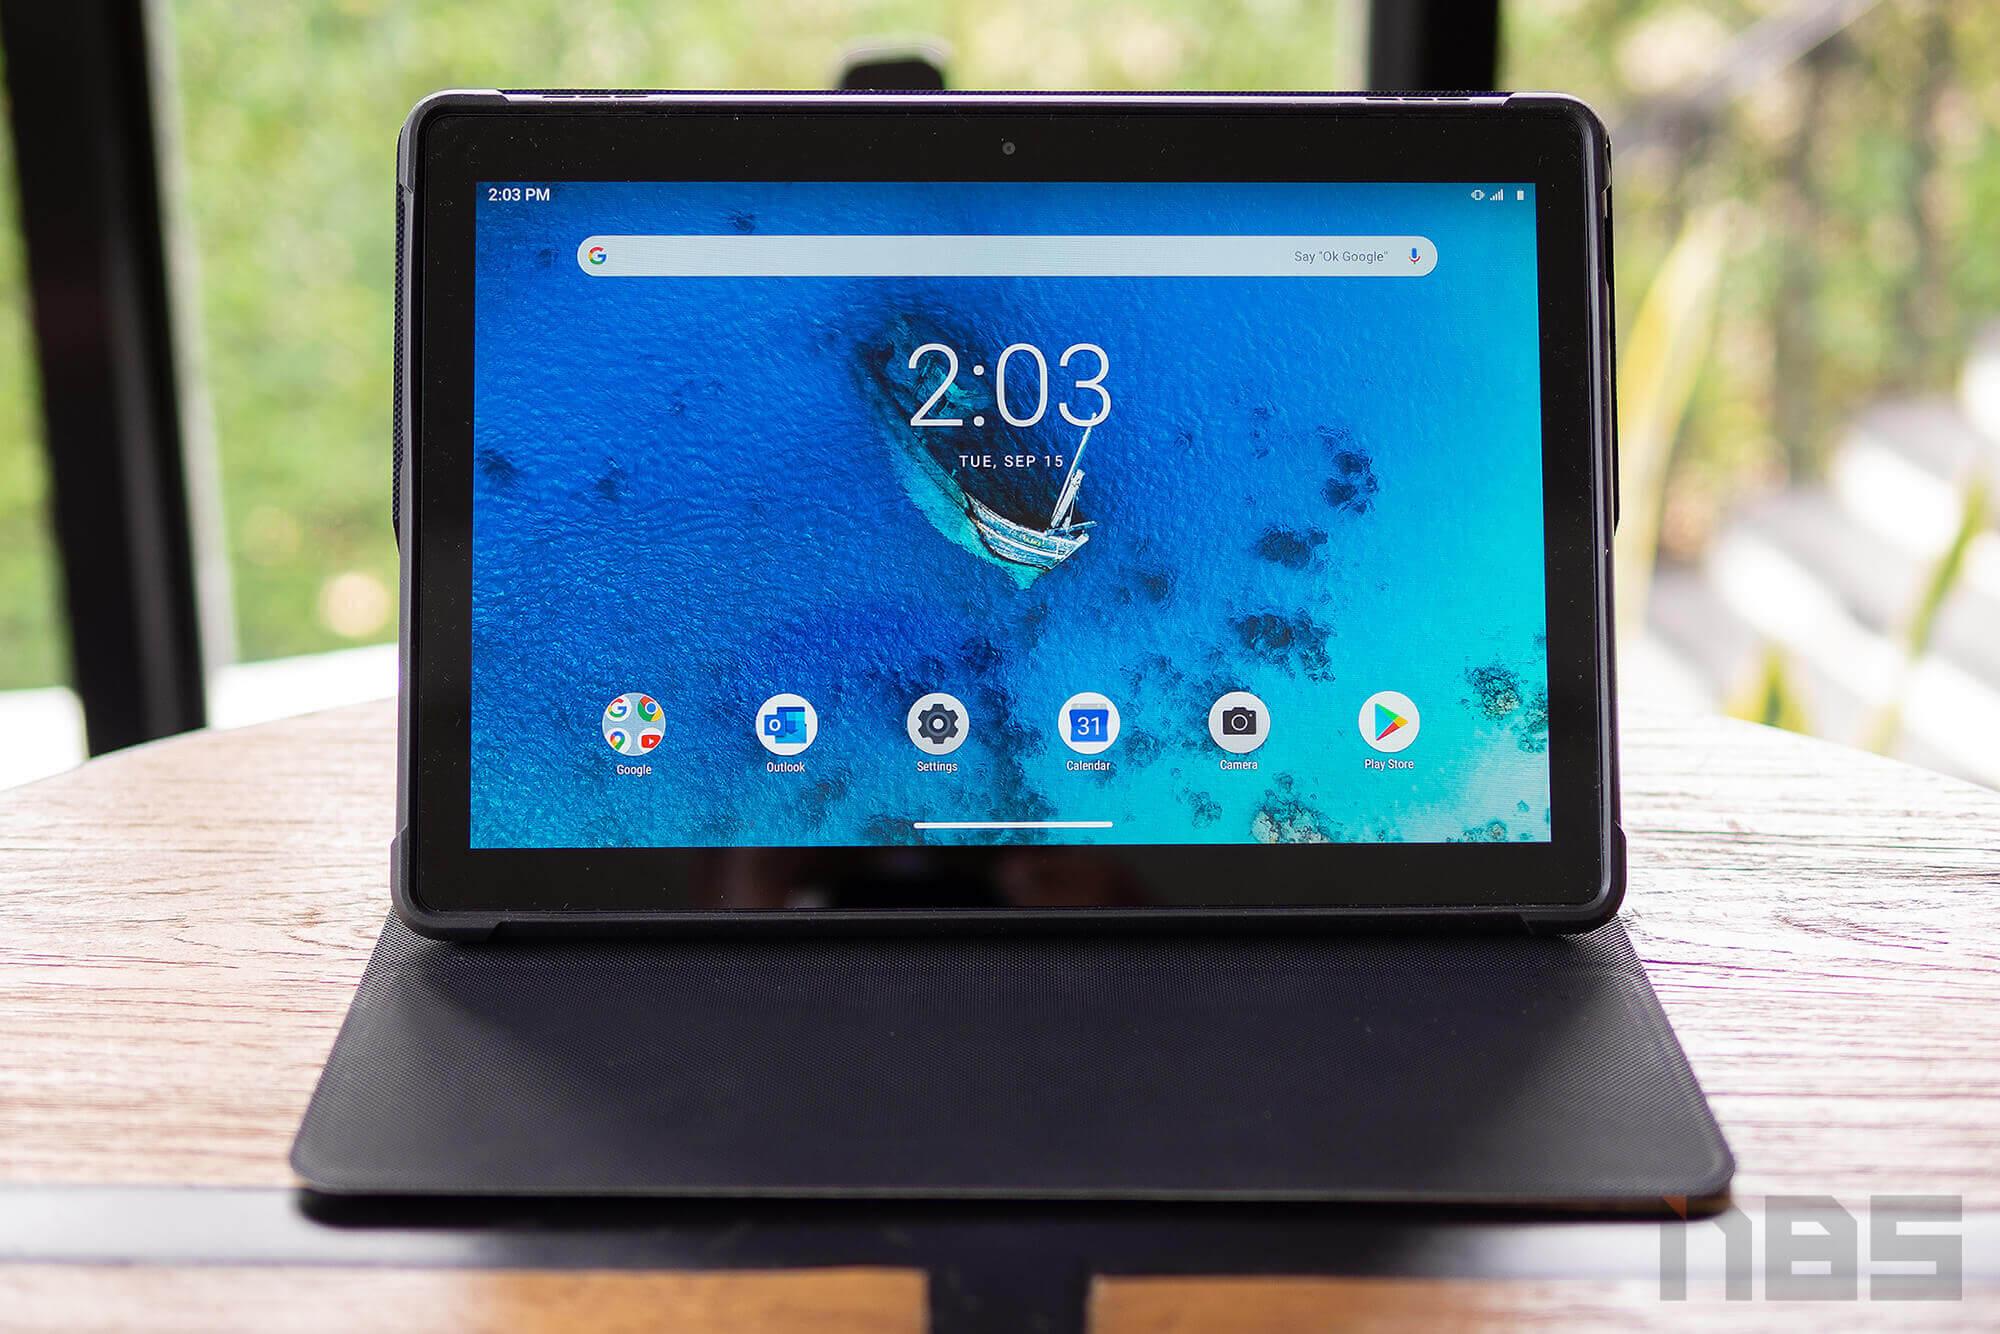 Review Lenovo Tab M10 REL FHD NotebookSPEC 1